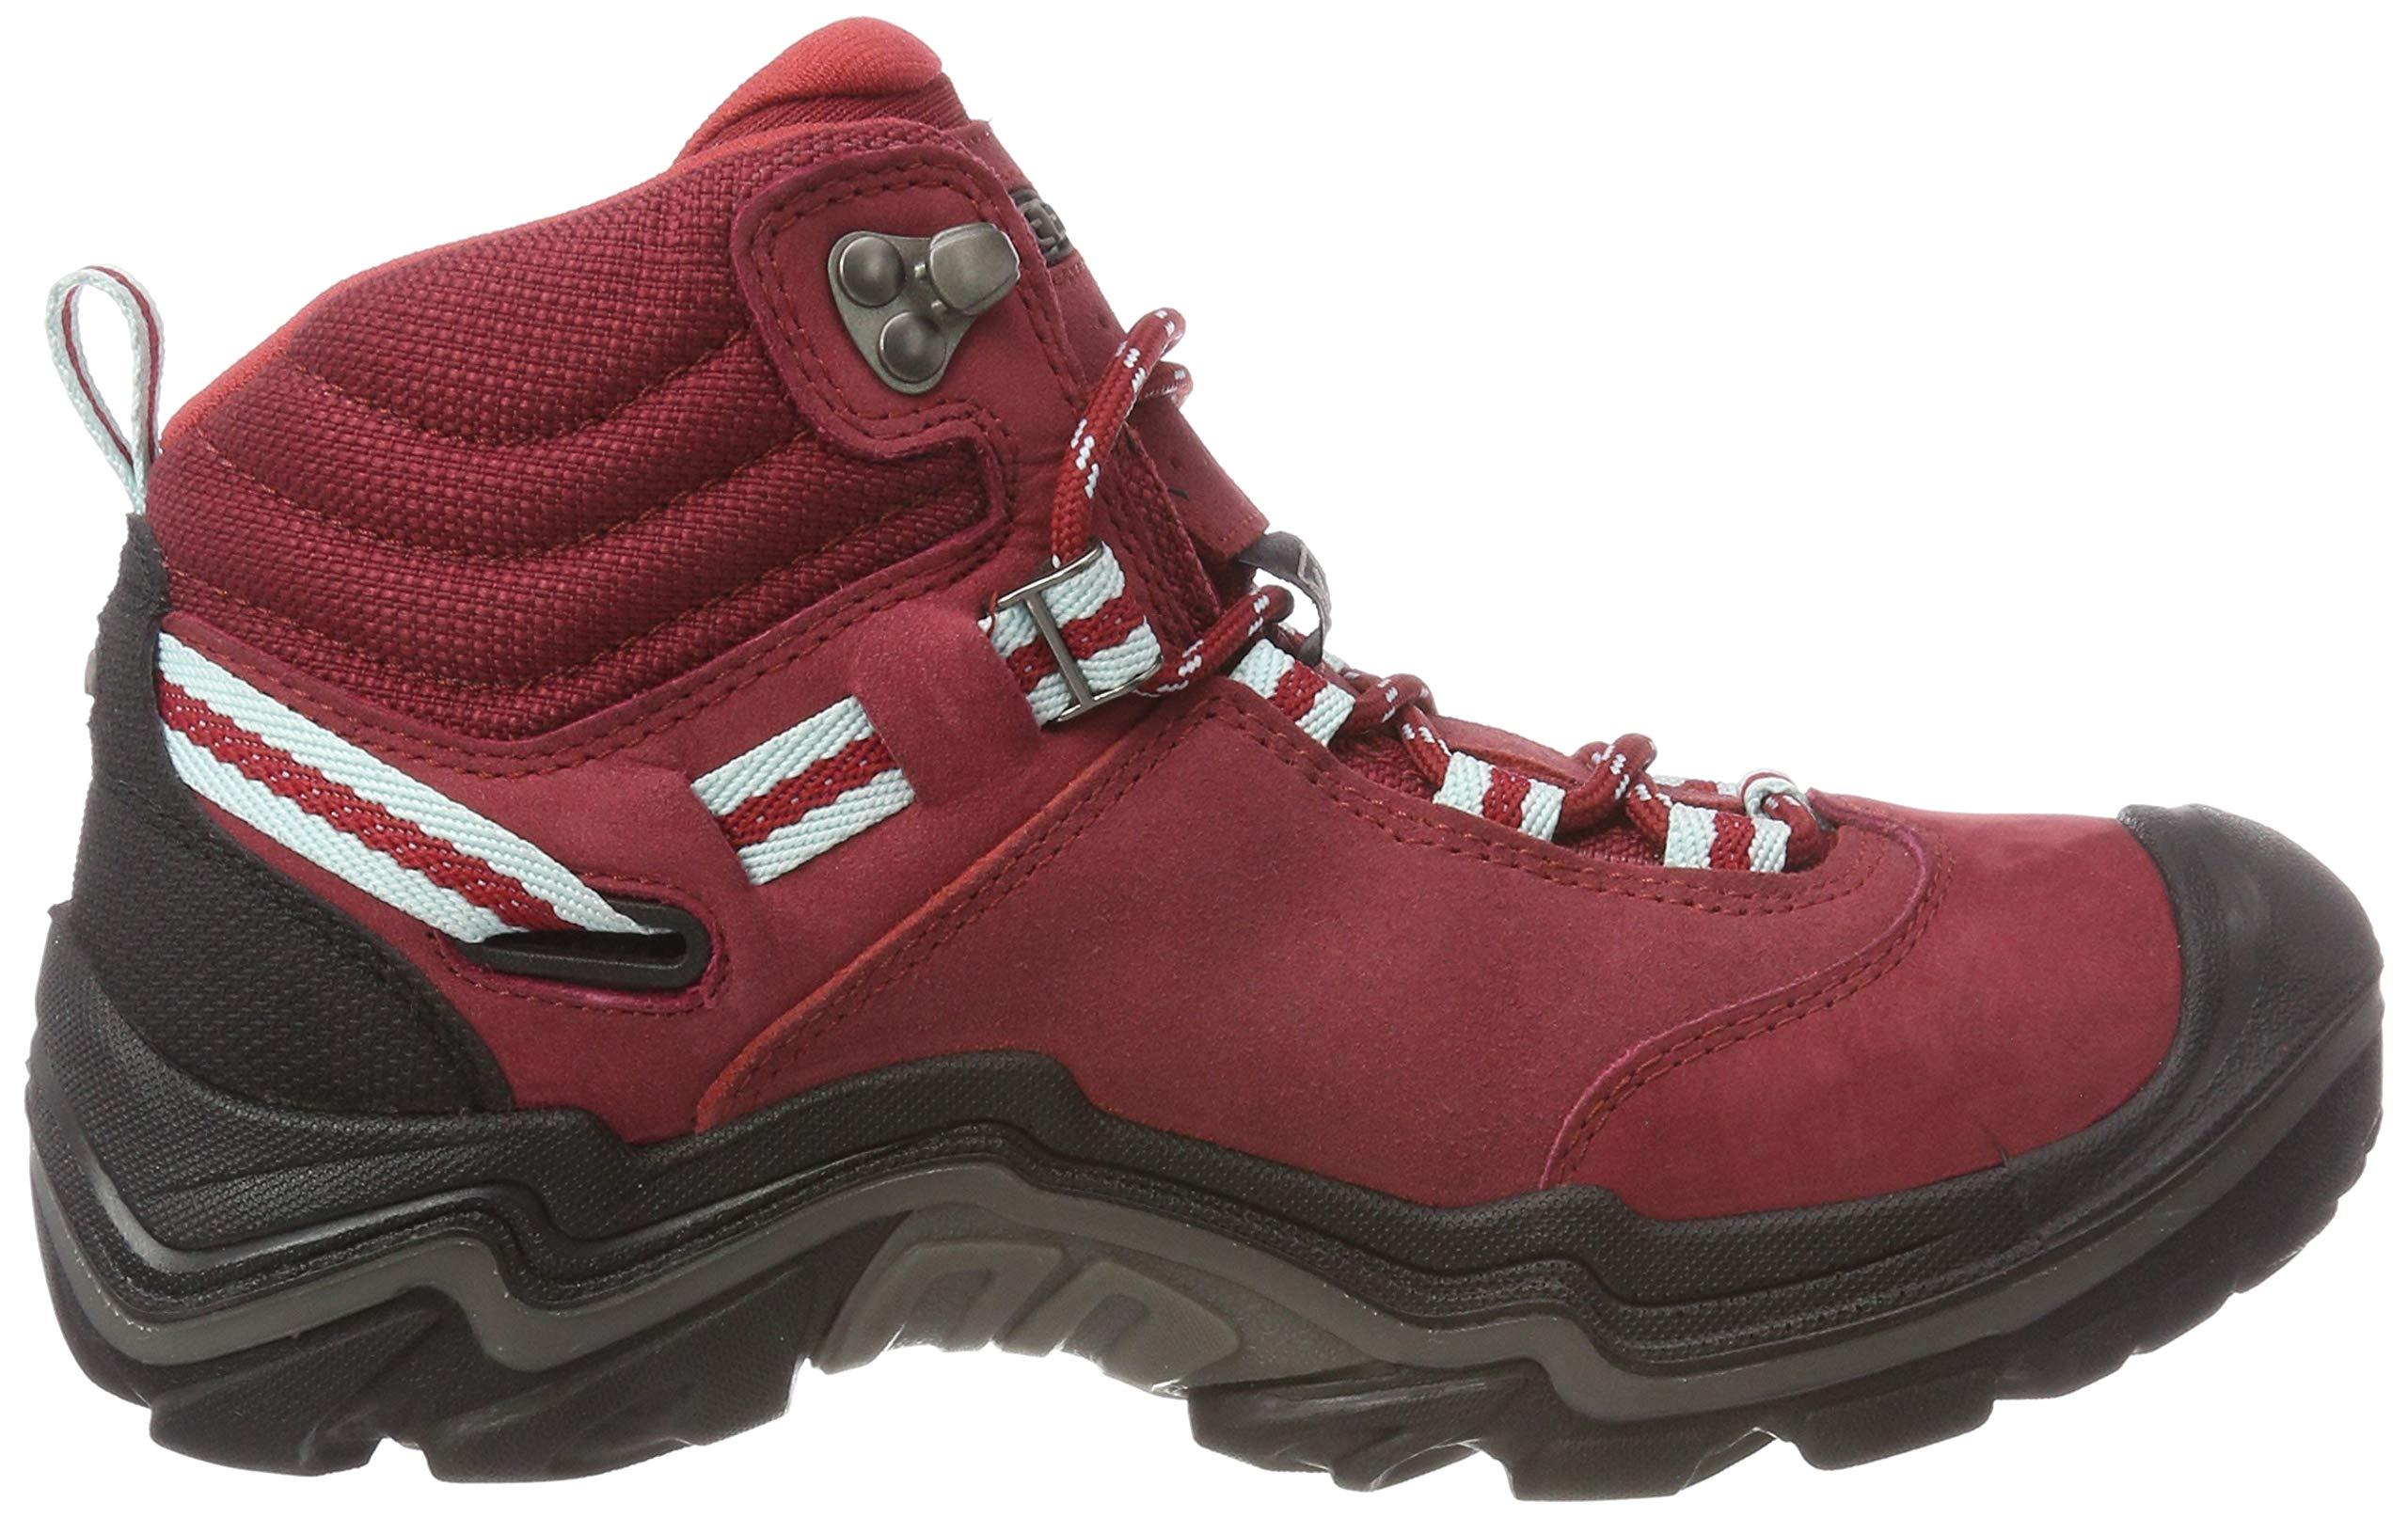 KEEN Women's Wanderer Waterproof Mid High Rise Hiking Shoes, 8.5 UK 6